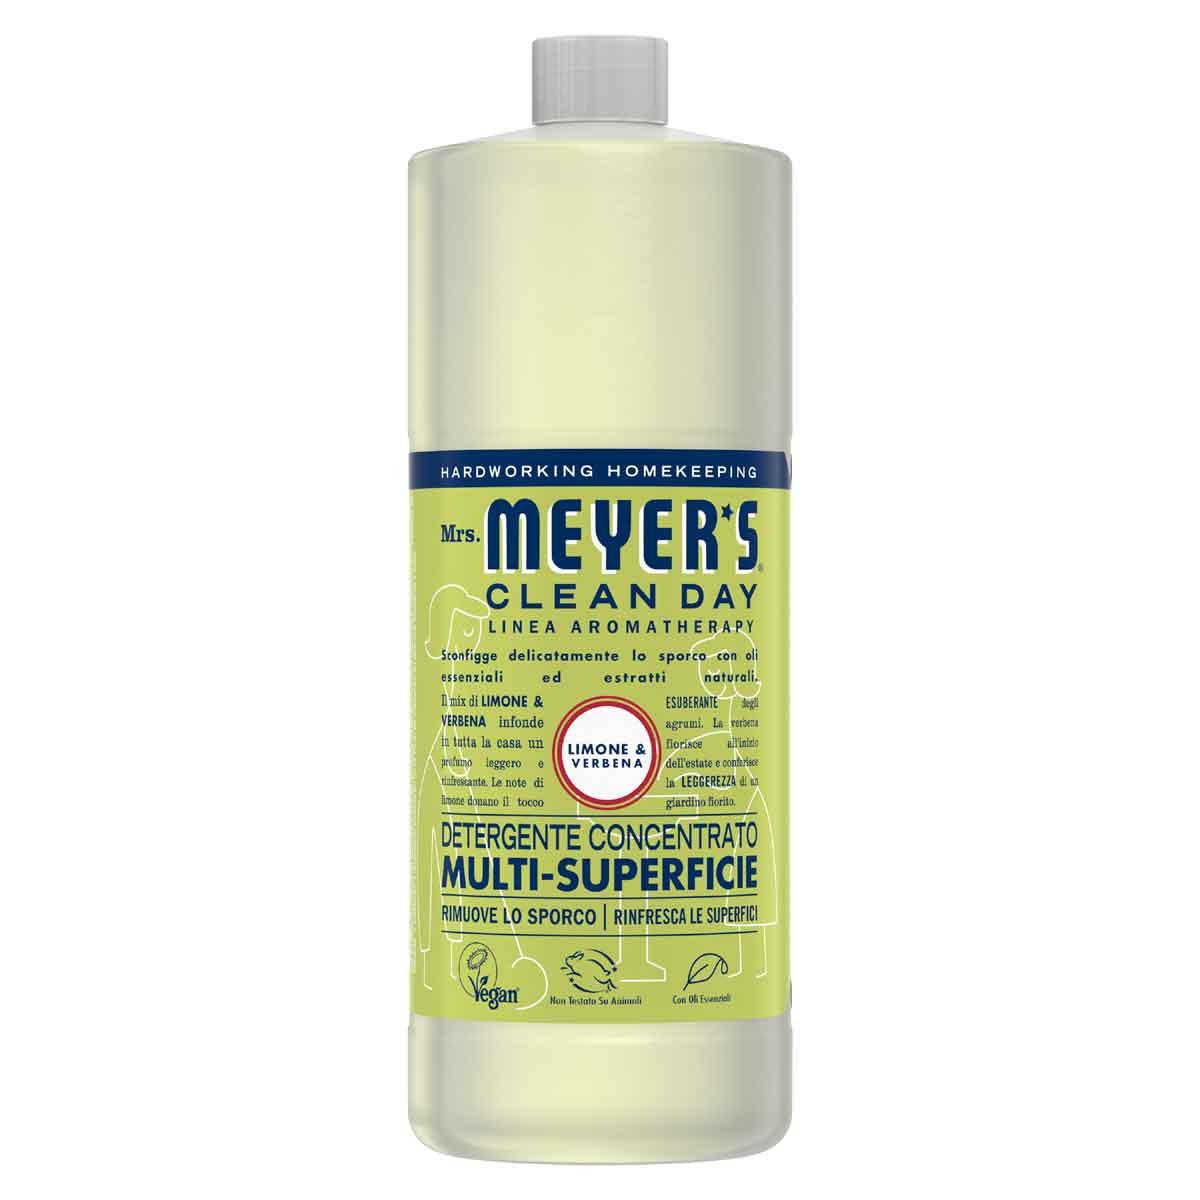 Mrs. Meyer's Detergente Concentrato multi-superficie Limone & Verbena